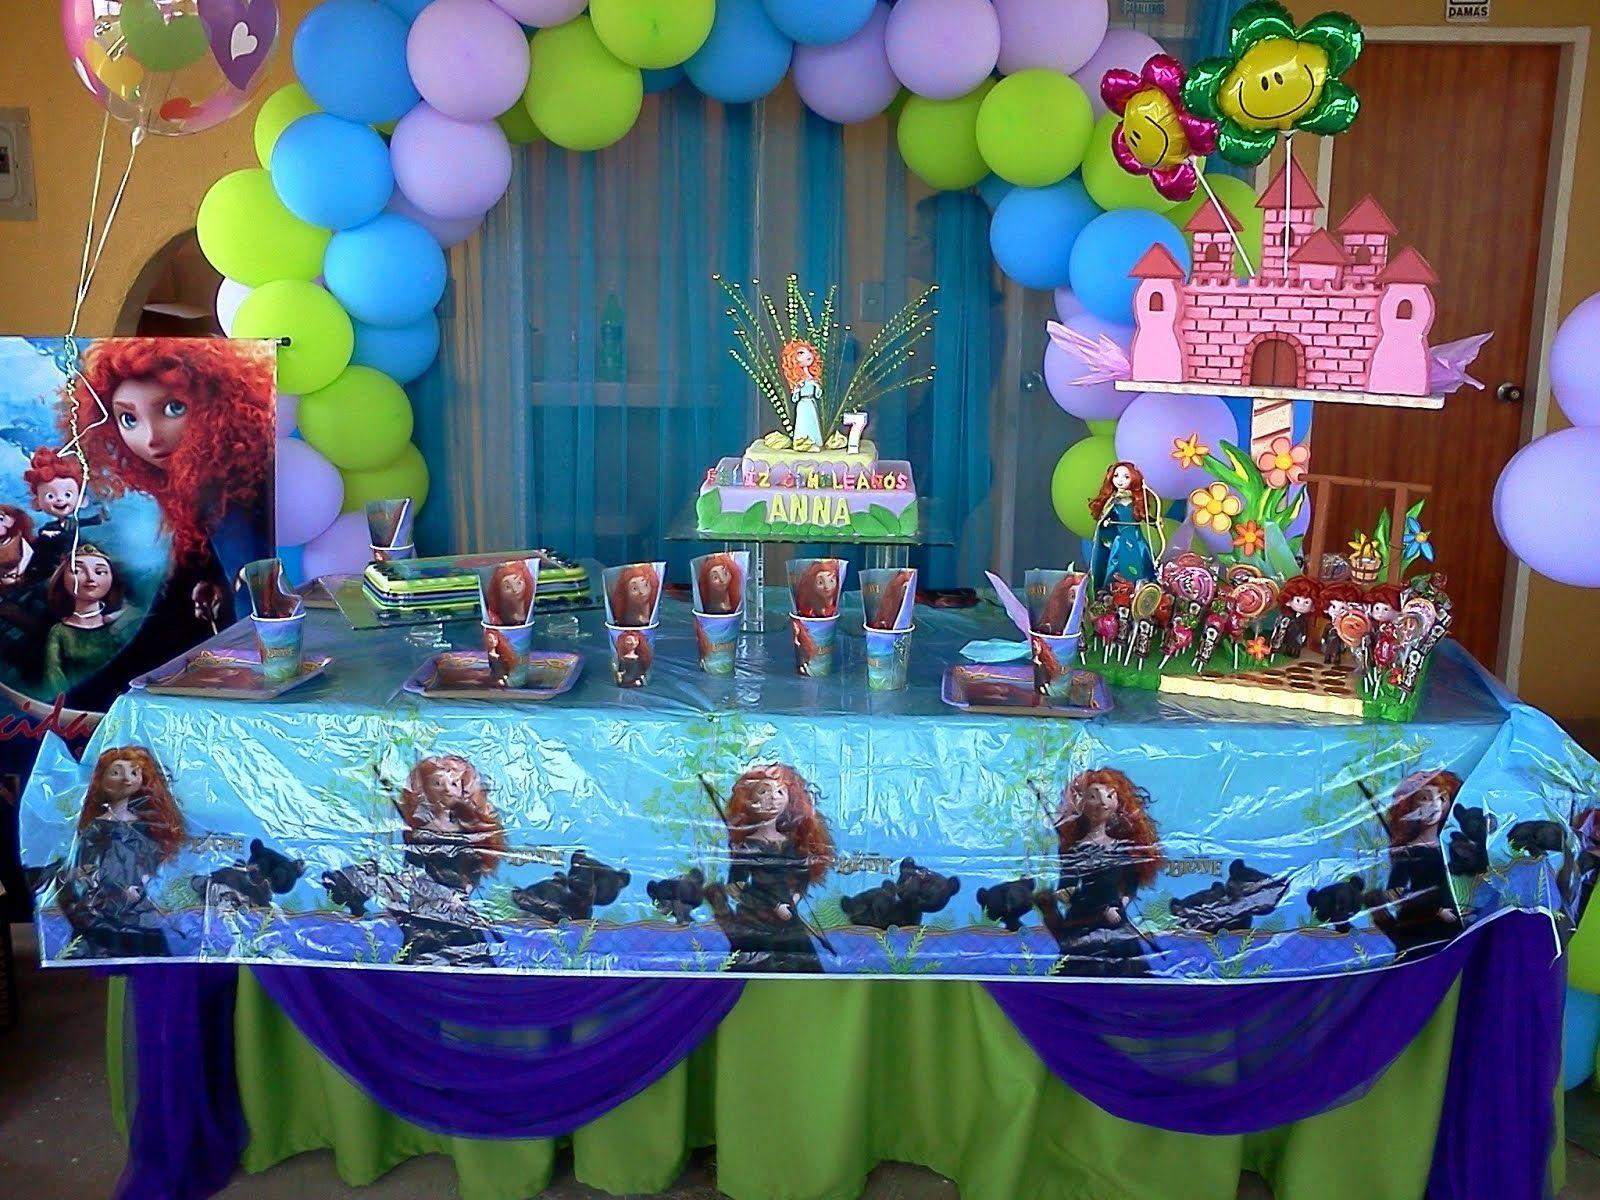 Decoraci n de valiente para cumplea os merida and birthdays - Decoracion de mesa de cumpleanos infantil ...